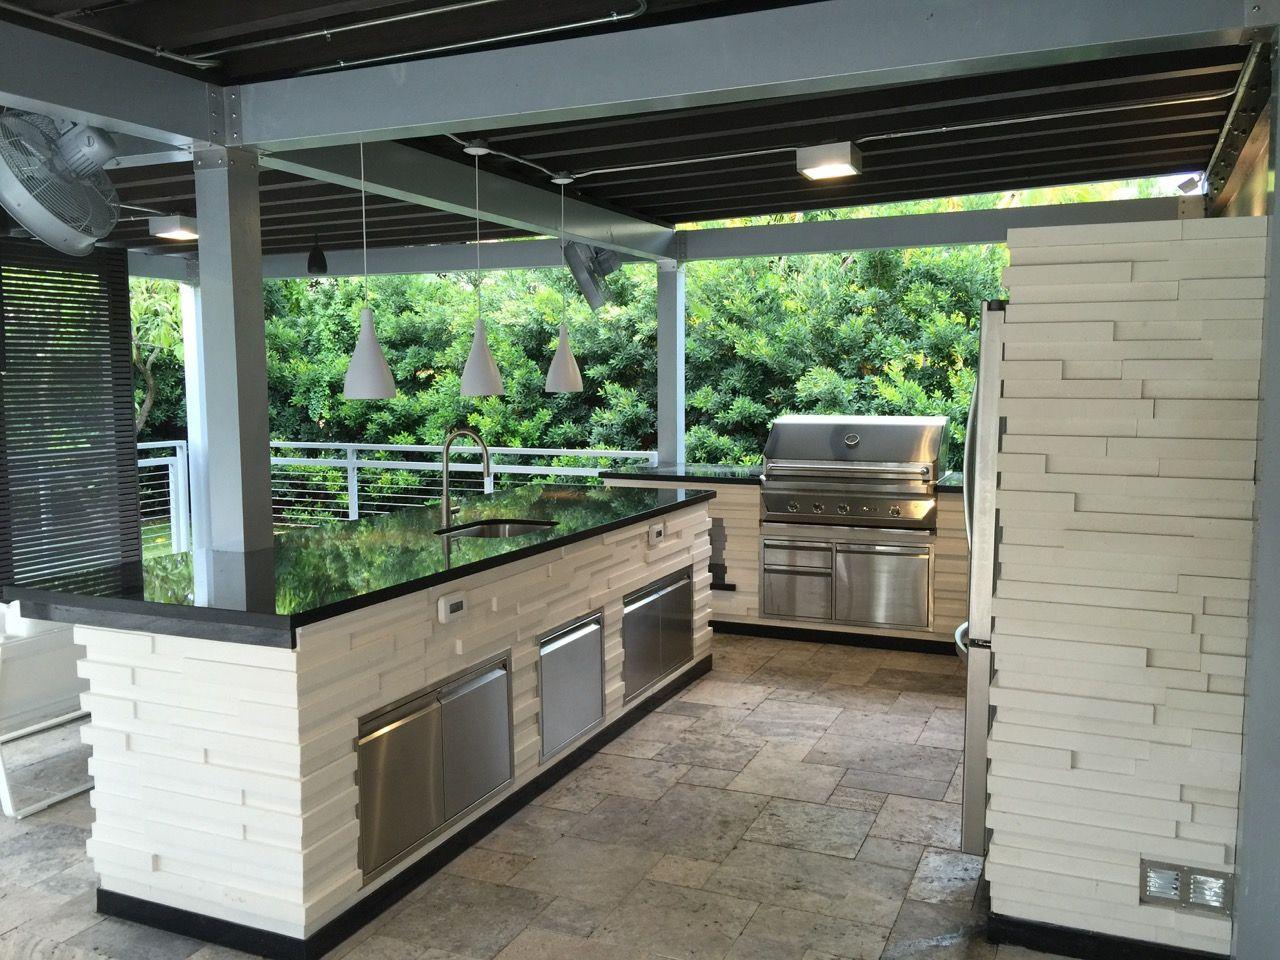 Outdoor Kitchens Luxapatio Outdoor Kitchen Outdoor Kitchen Design Outdoor Kitchen Appliances